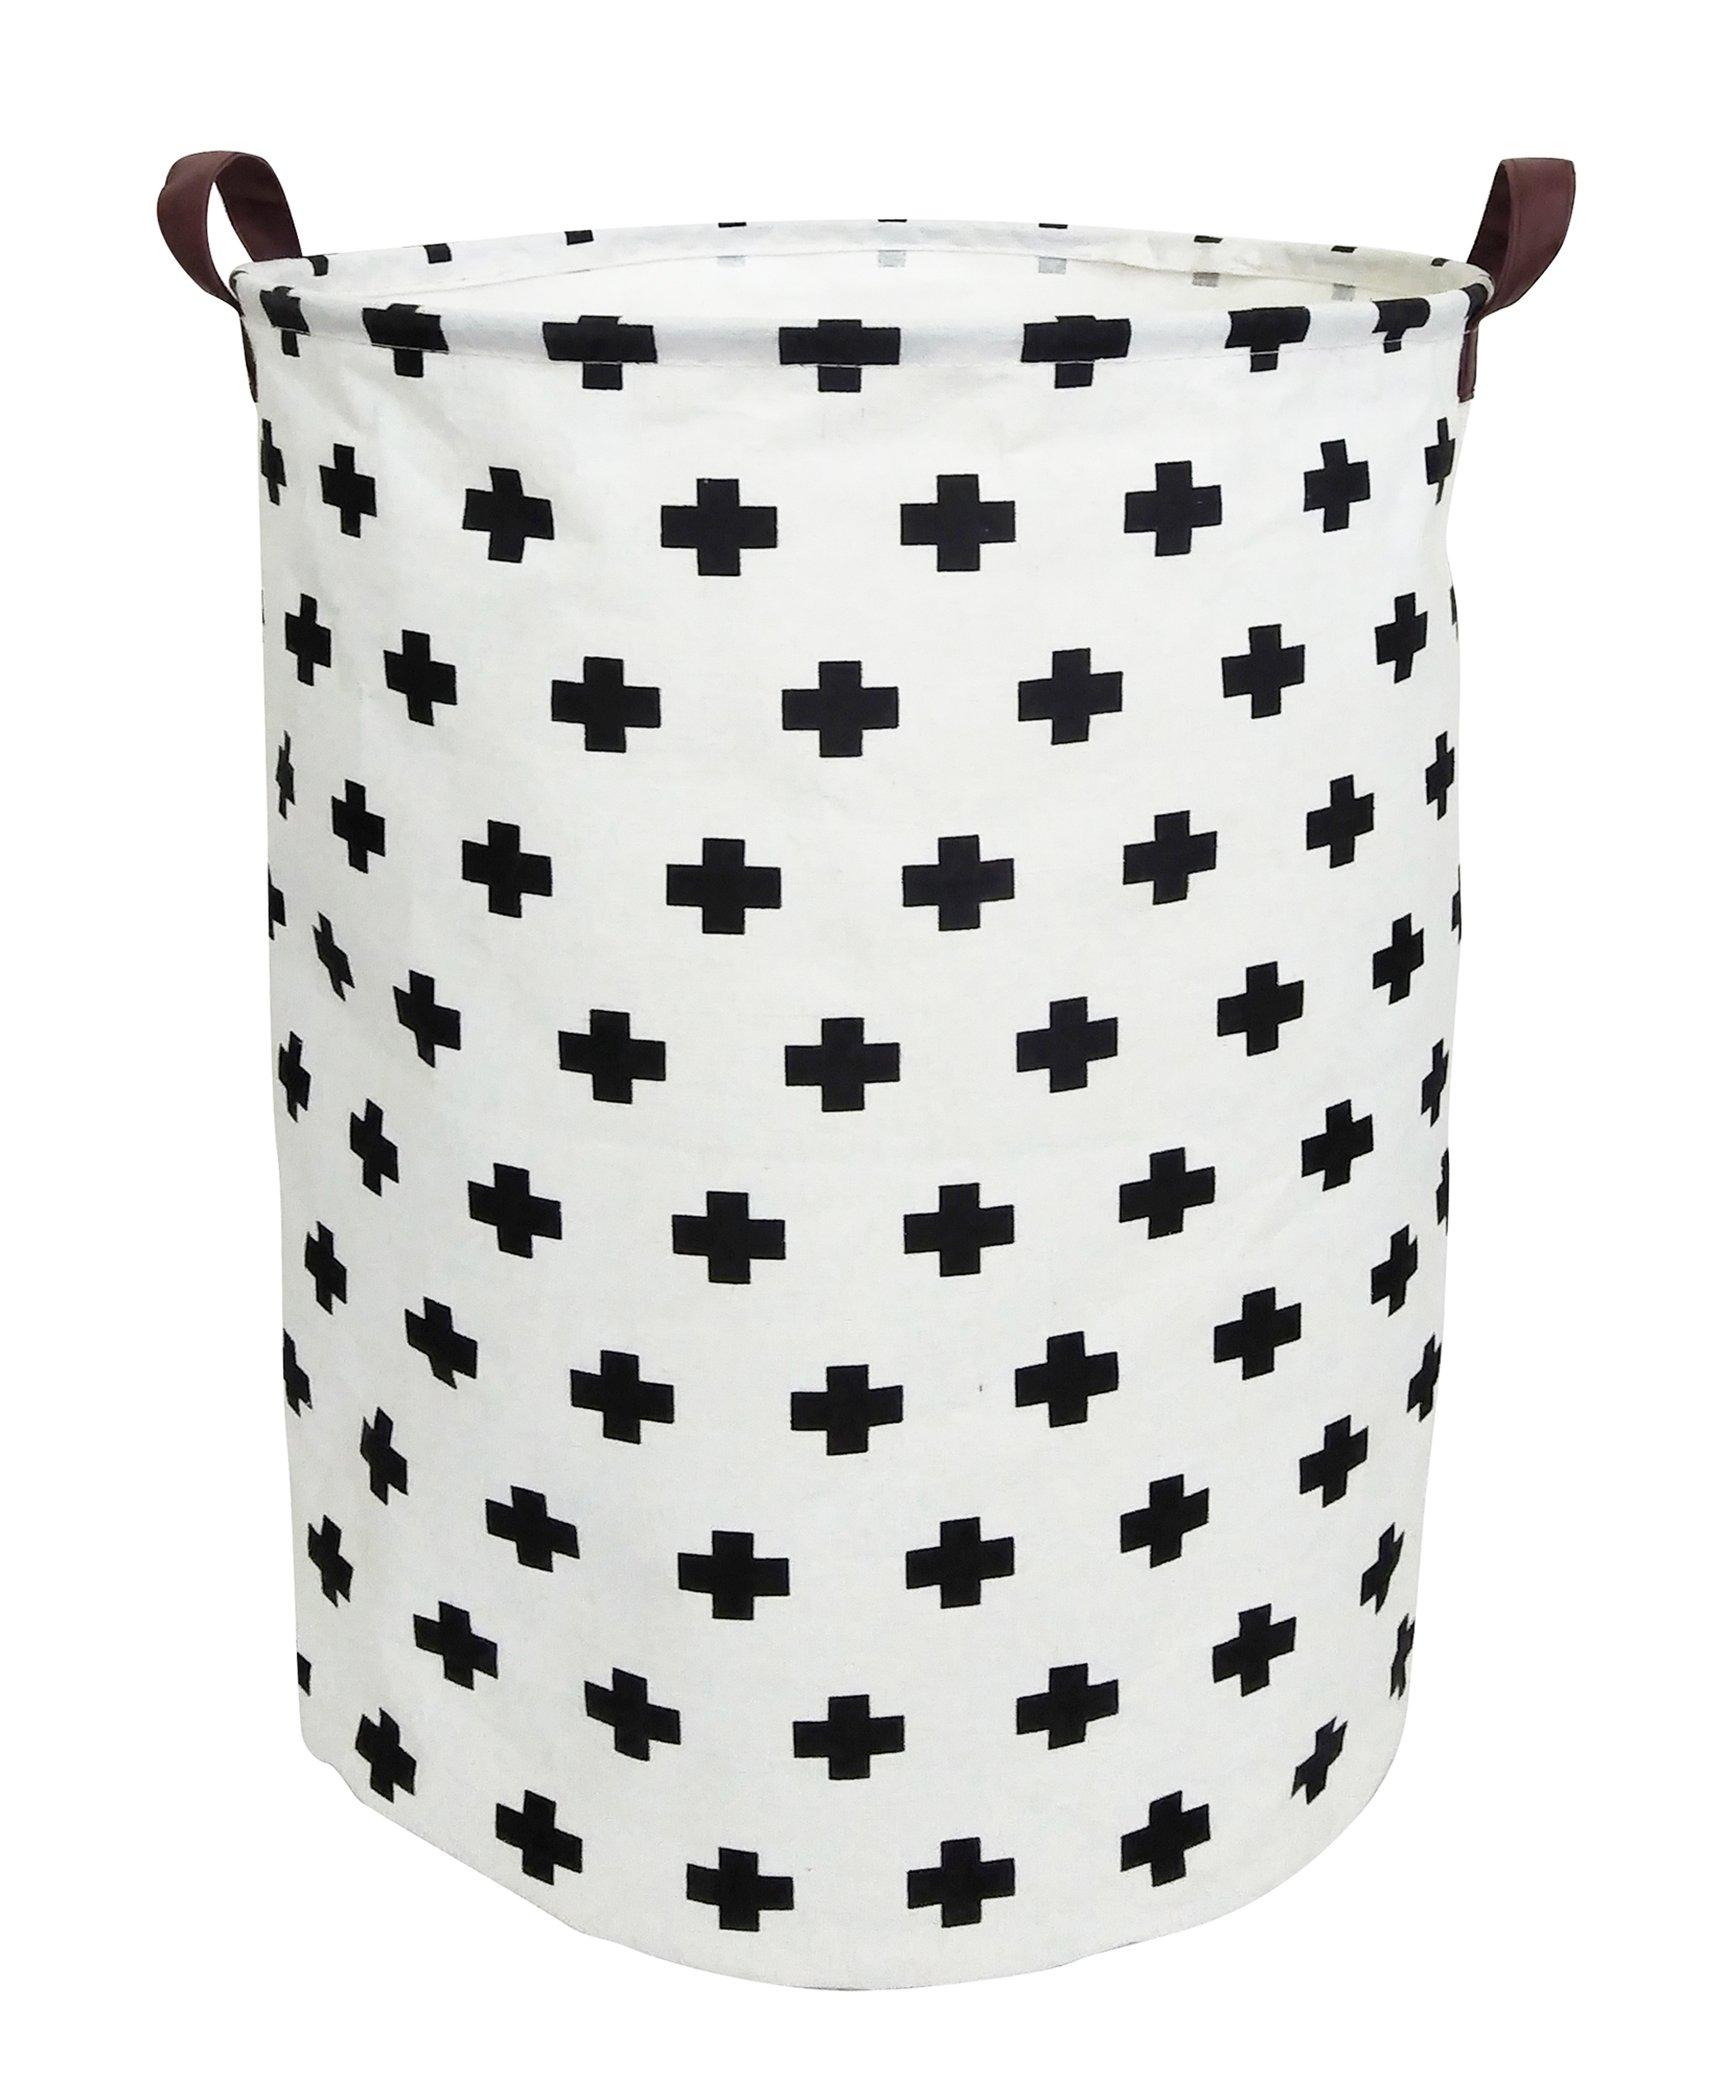 ESSME Large Laundry Hamper Waterproof Coating Canvas Fabric Storage Basket-Toy Organizer, Baby Nursery Hamper19.7×15.7''(plus sign) by ESSME